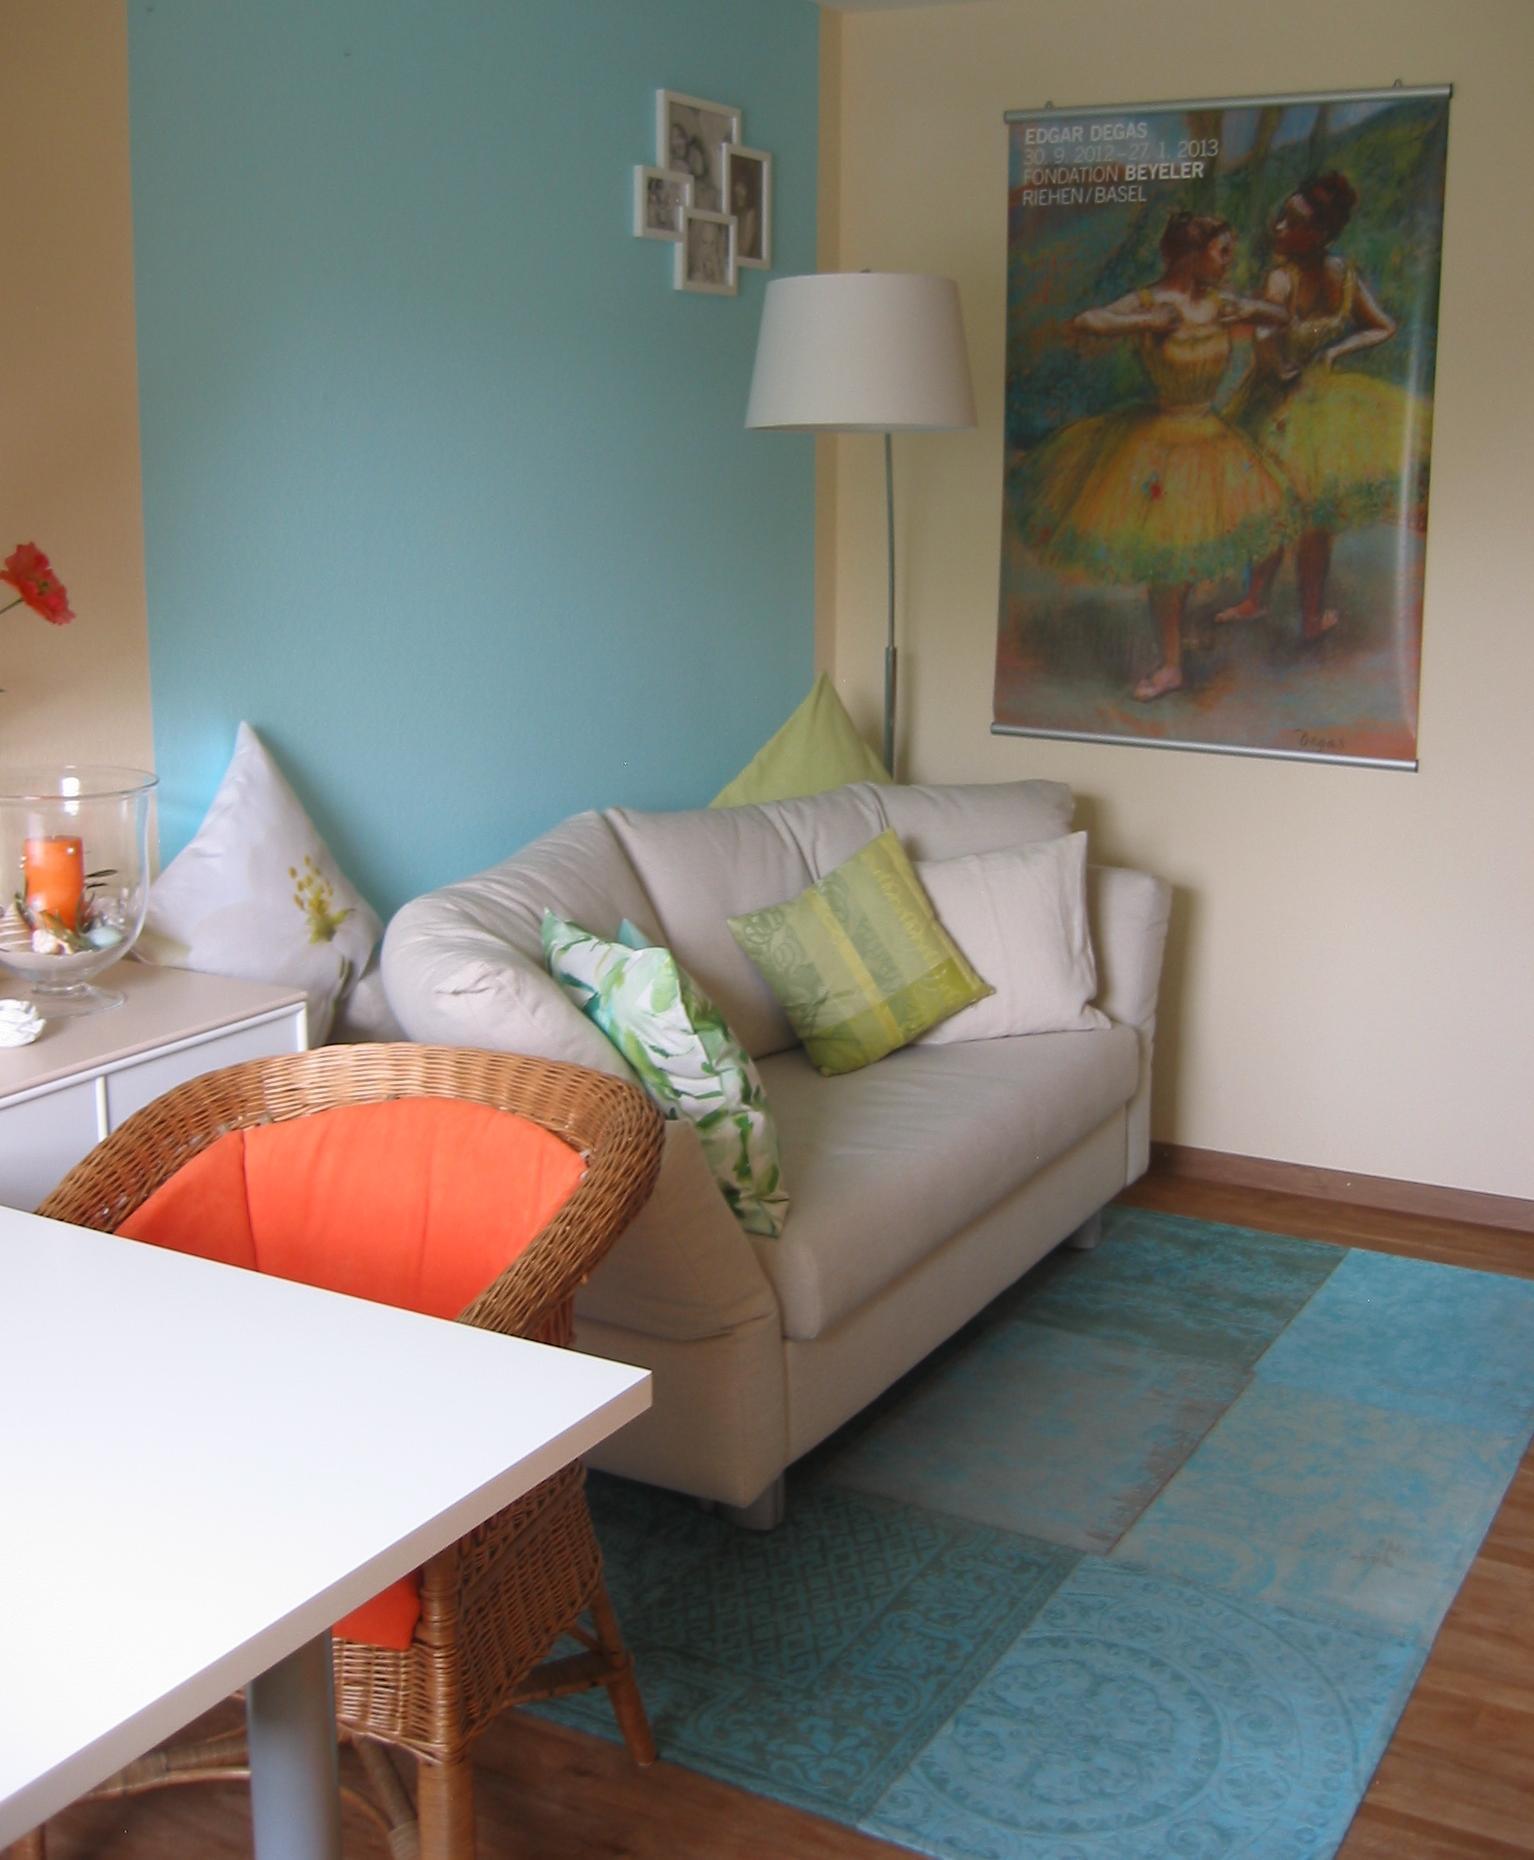 Wandfarbe in t rkis bilder ideen couchstyle - Wandfarbe arbeitszimmer ...